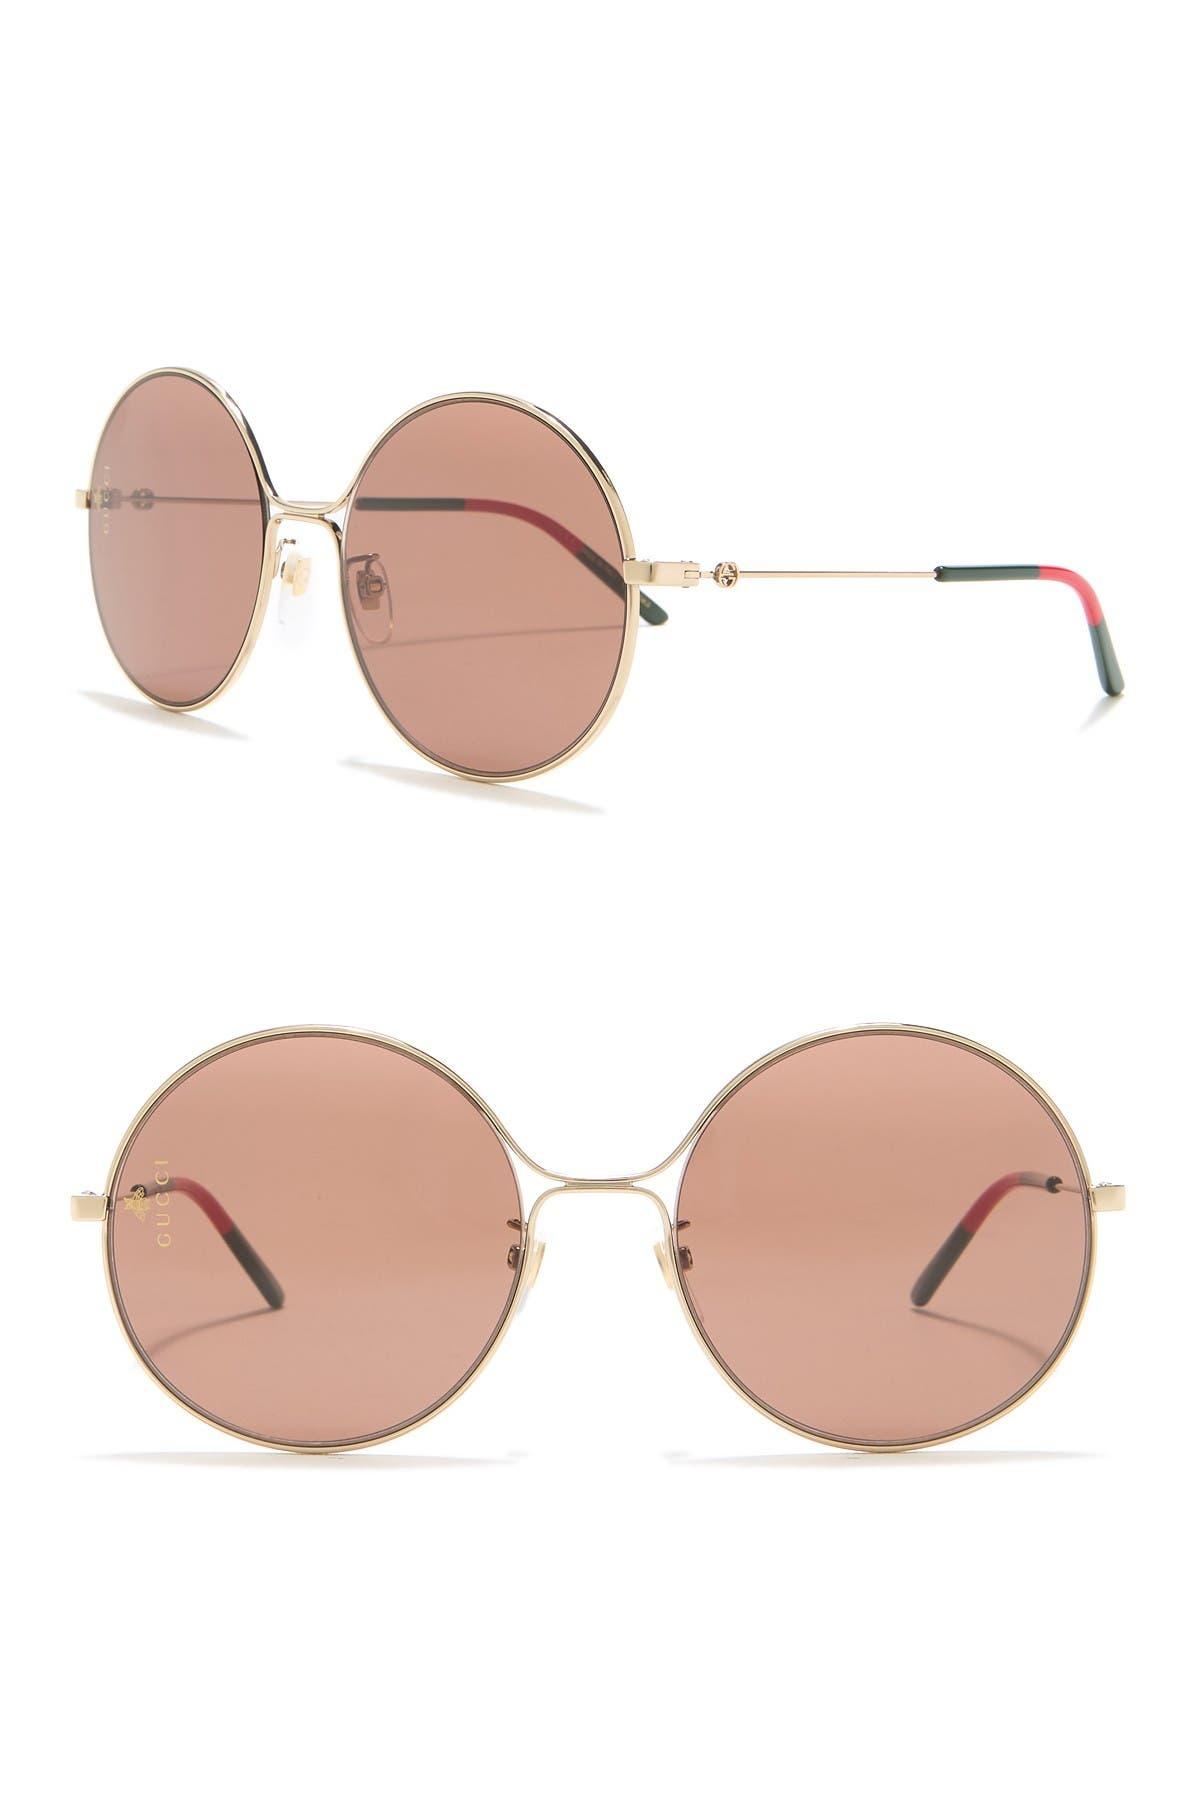 Image of GUCCI 58mm Round Sunglasses